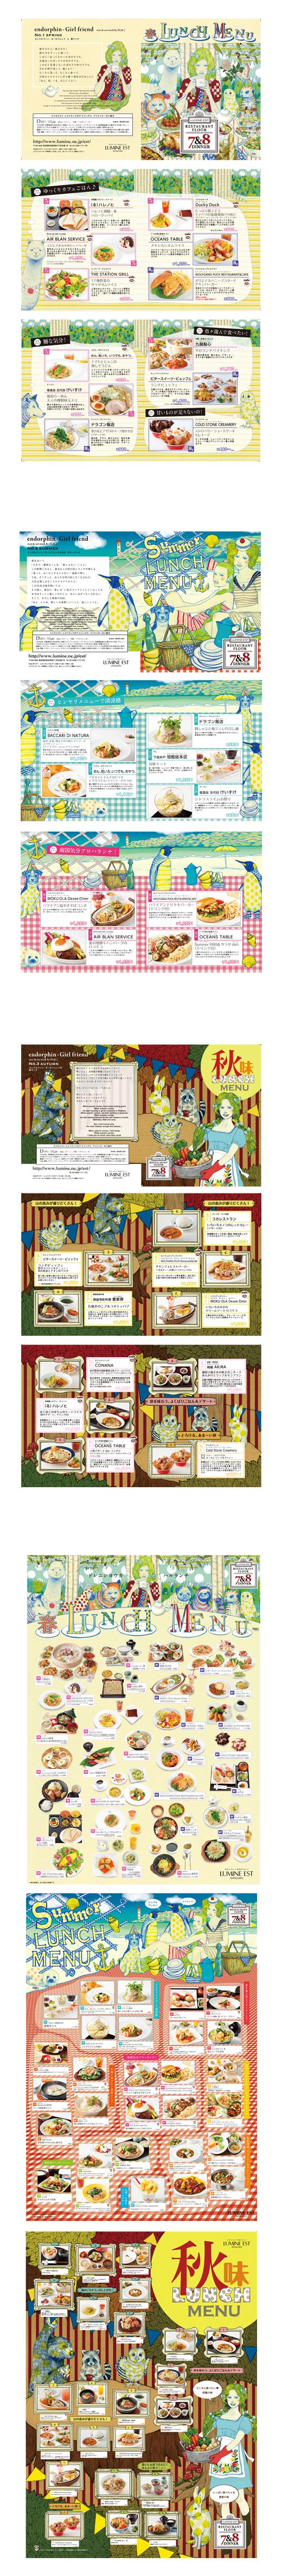 LUMINE EST新宿店 レストランフロア リーフレット